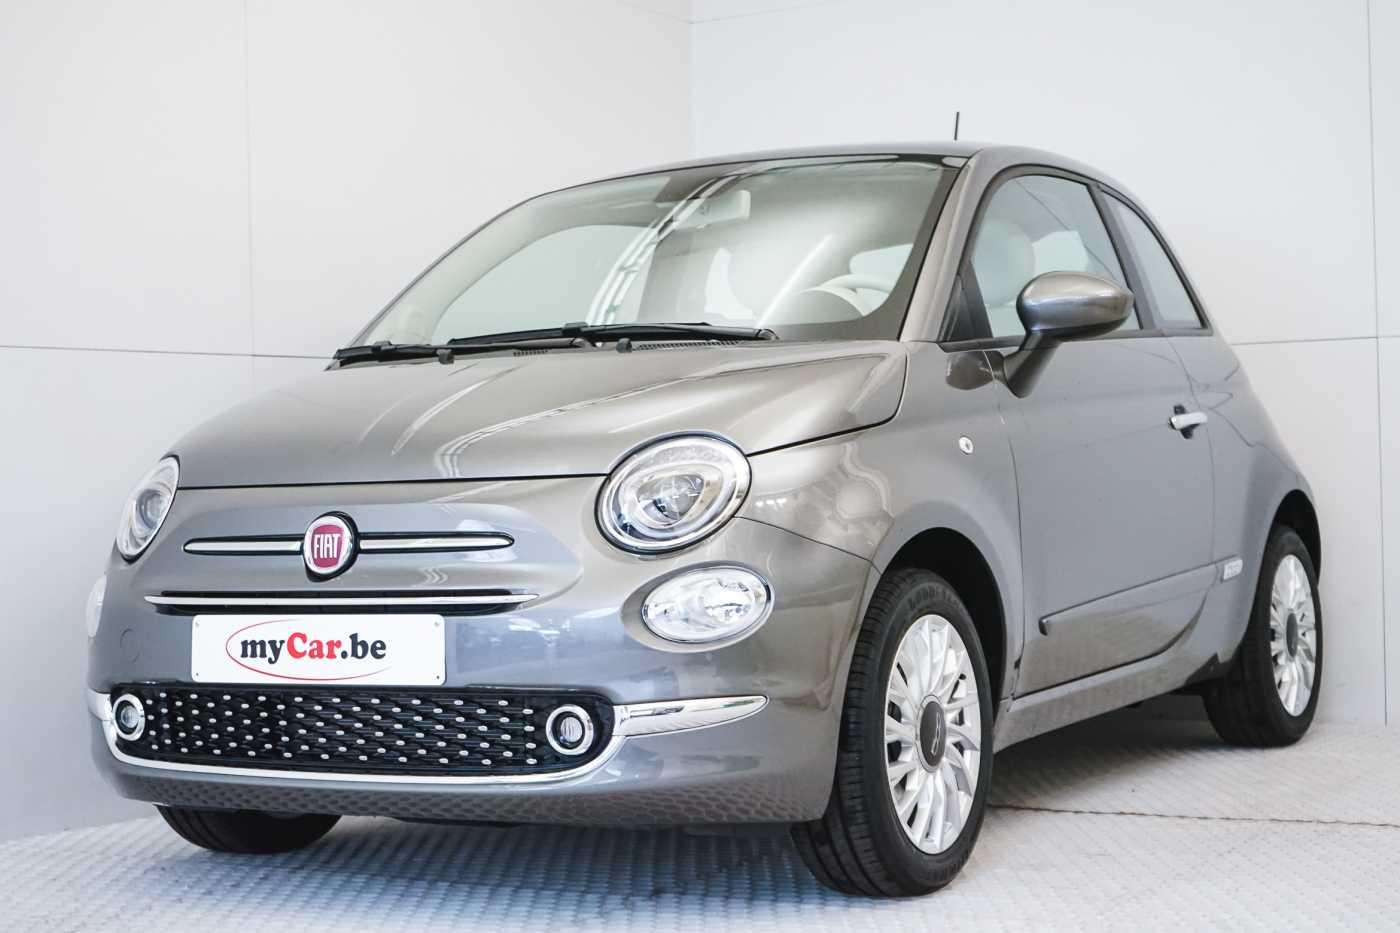 Fiat 500 Lounge Hybrid // Airco, Pano dak, Bluetooth